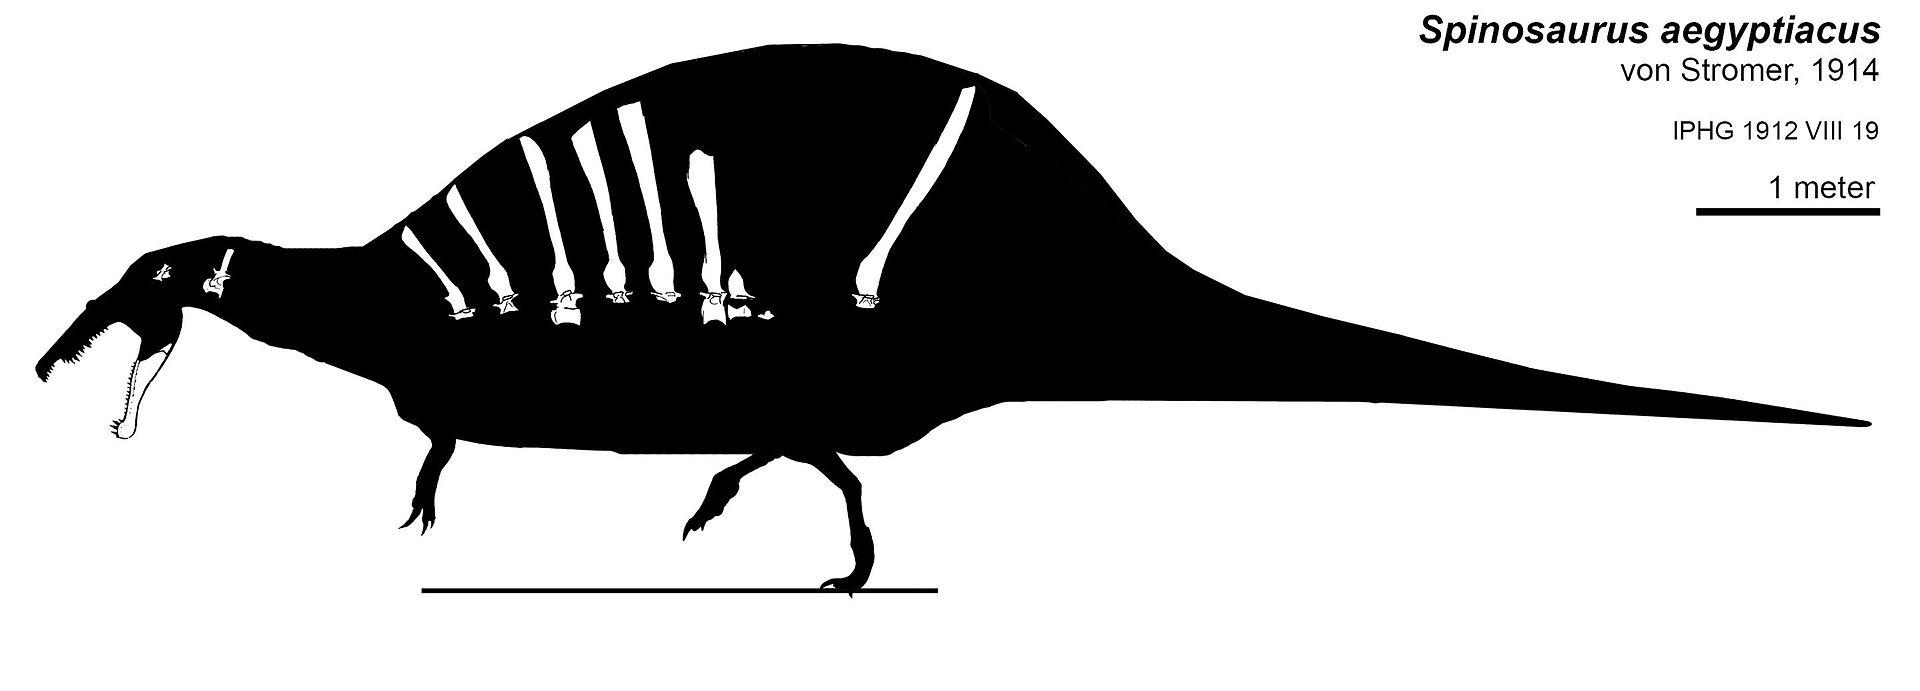 Spinosaurus, holotipo